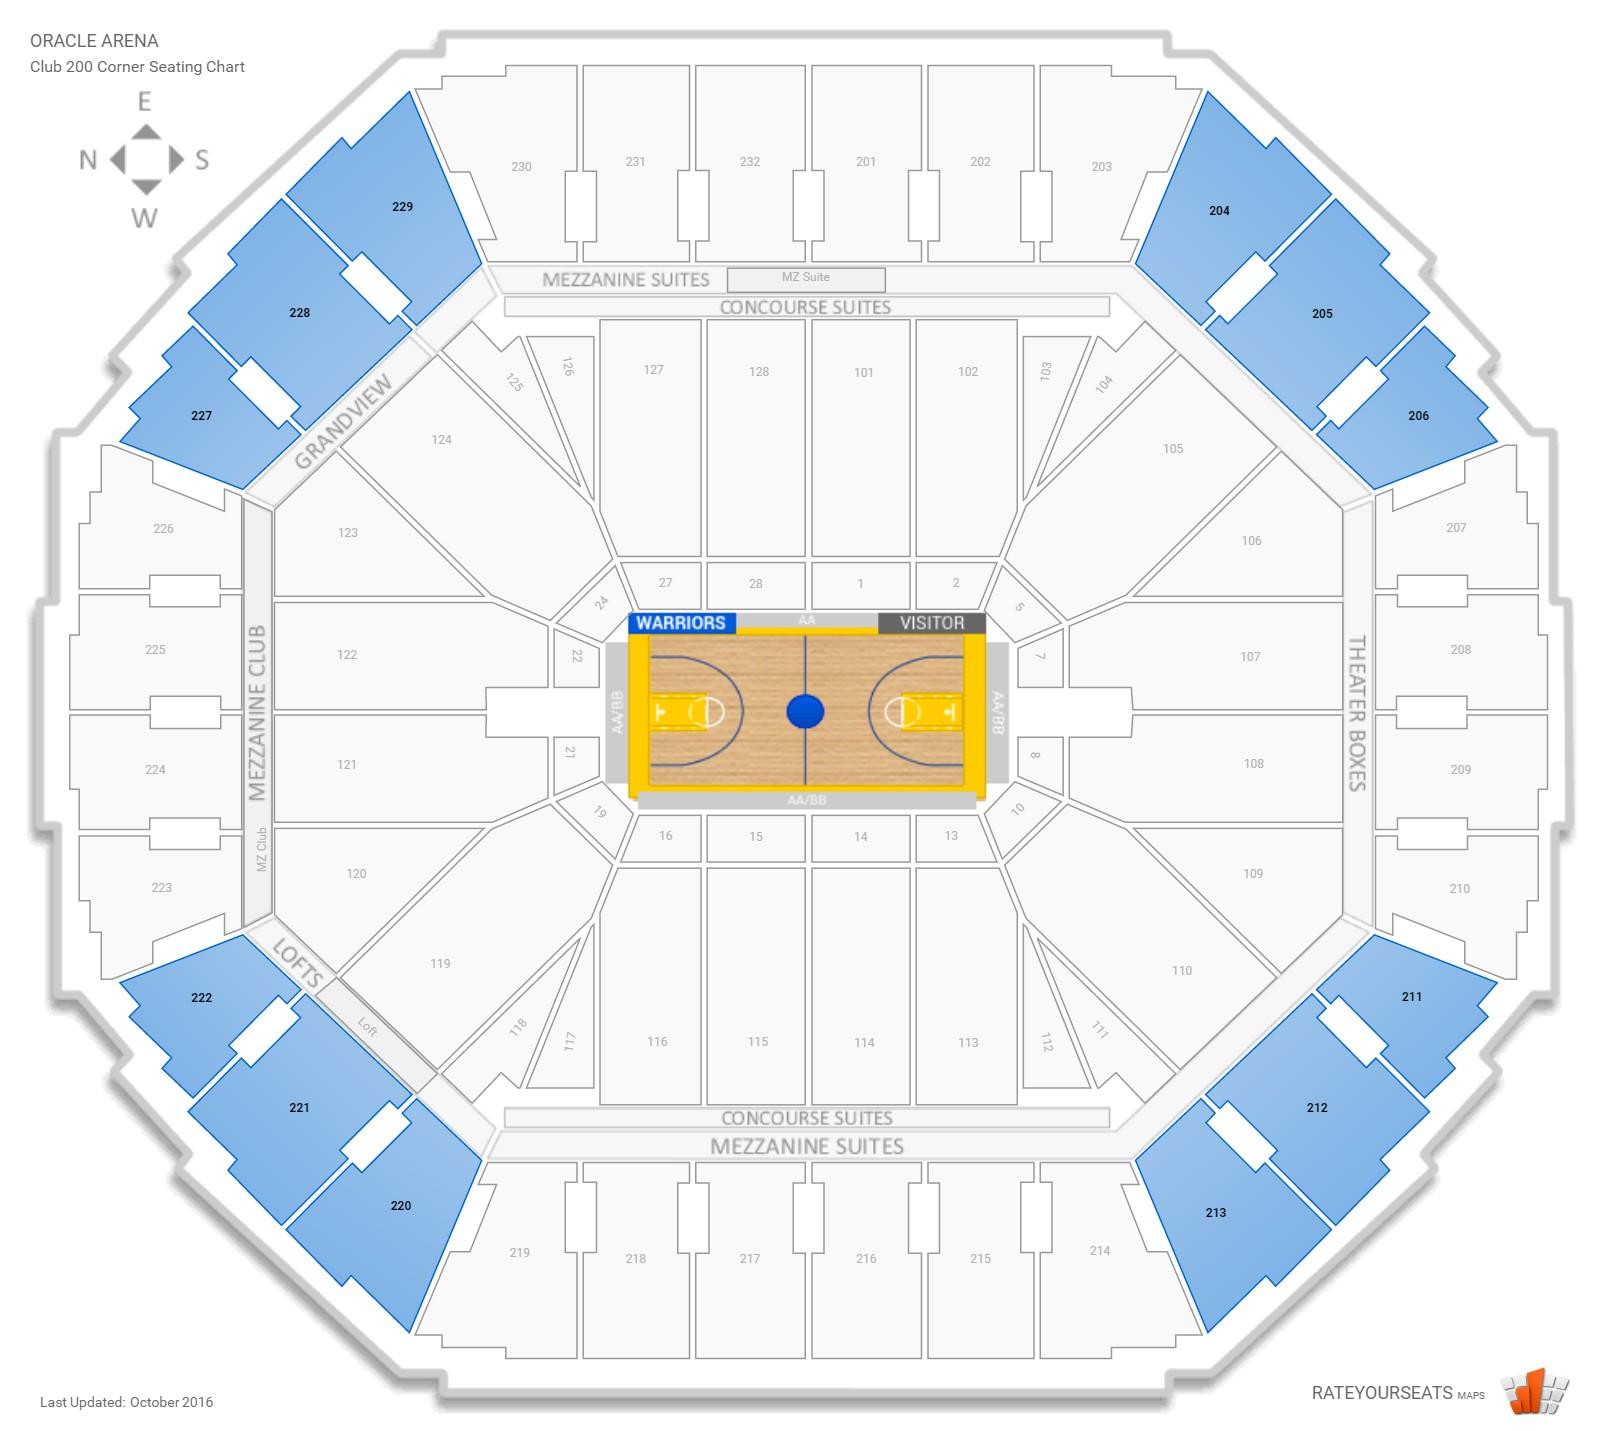 New Warriors Stadium Inside: Oracle Arena Basketball Seating